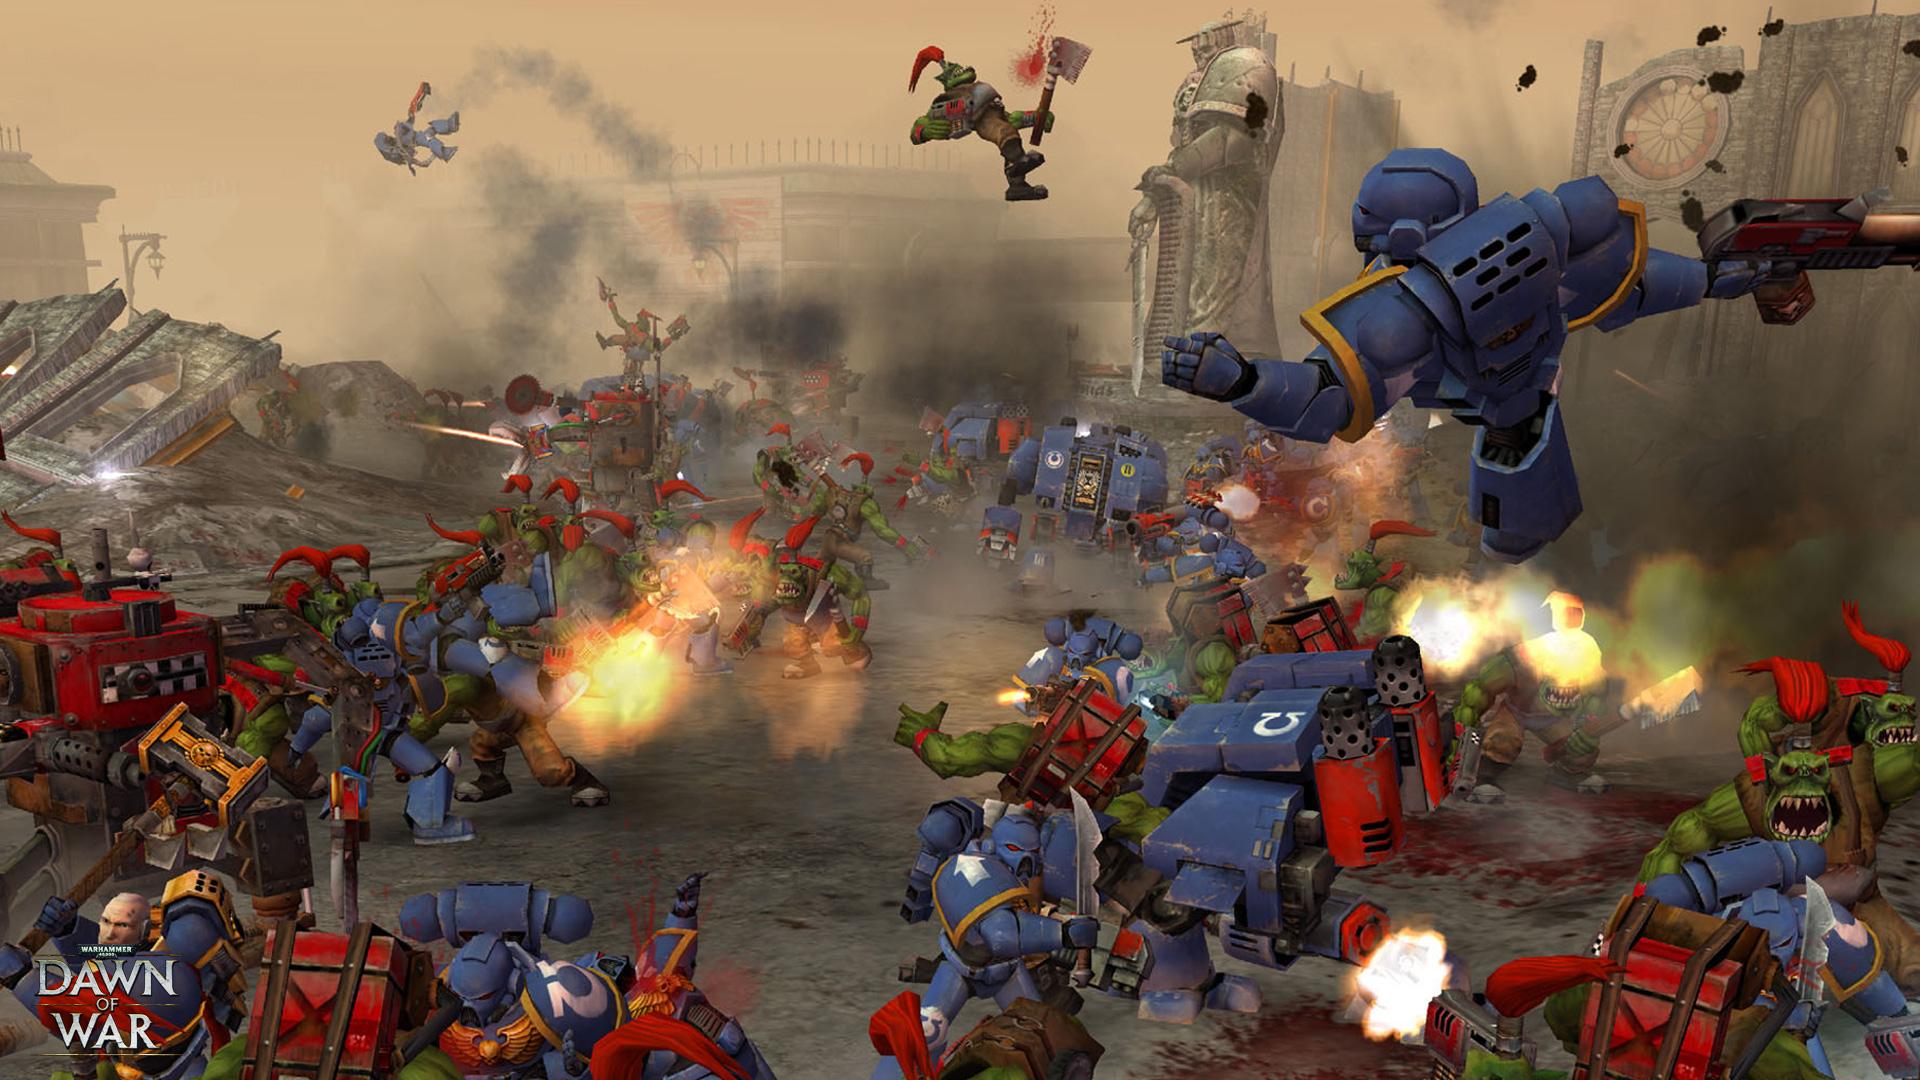 Warhammer 40,000: Dawn of War - Game of the Year Edition screenshot